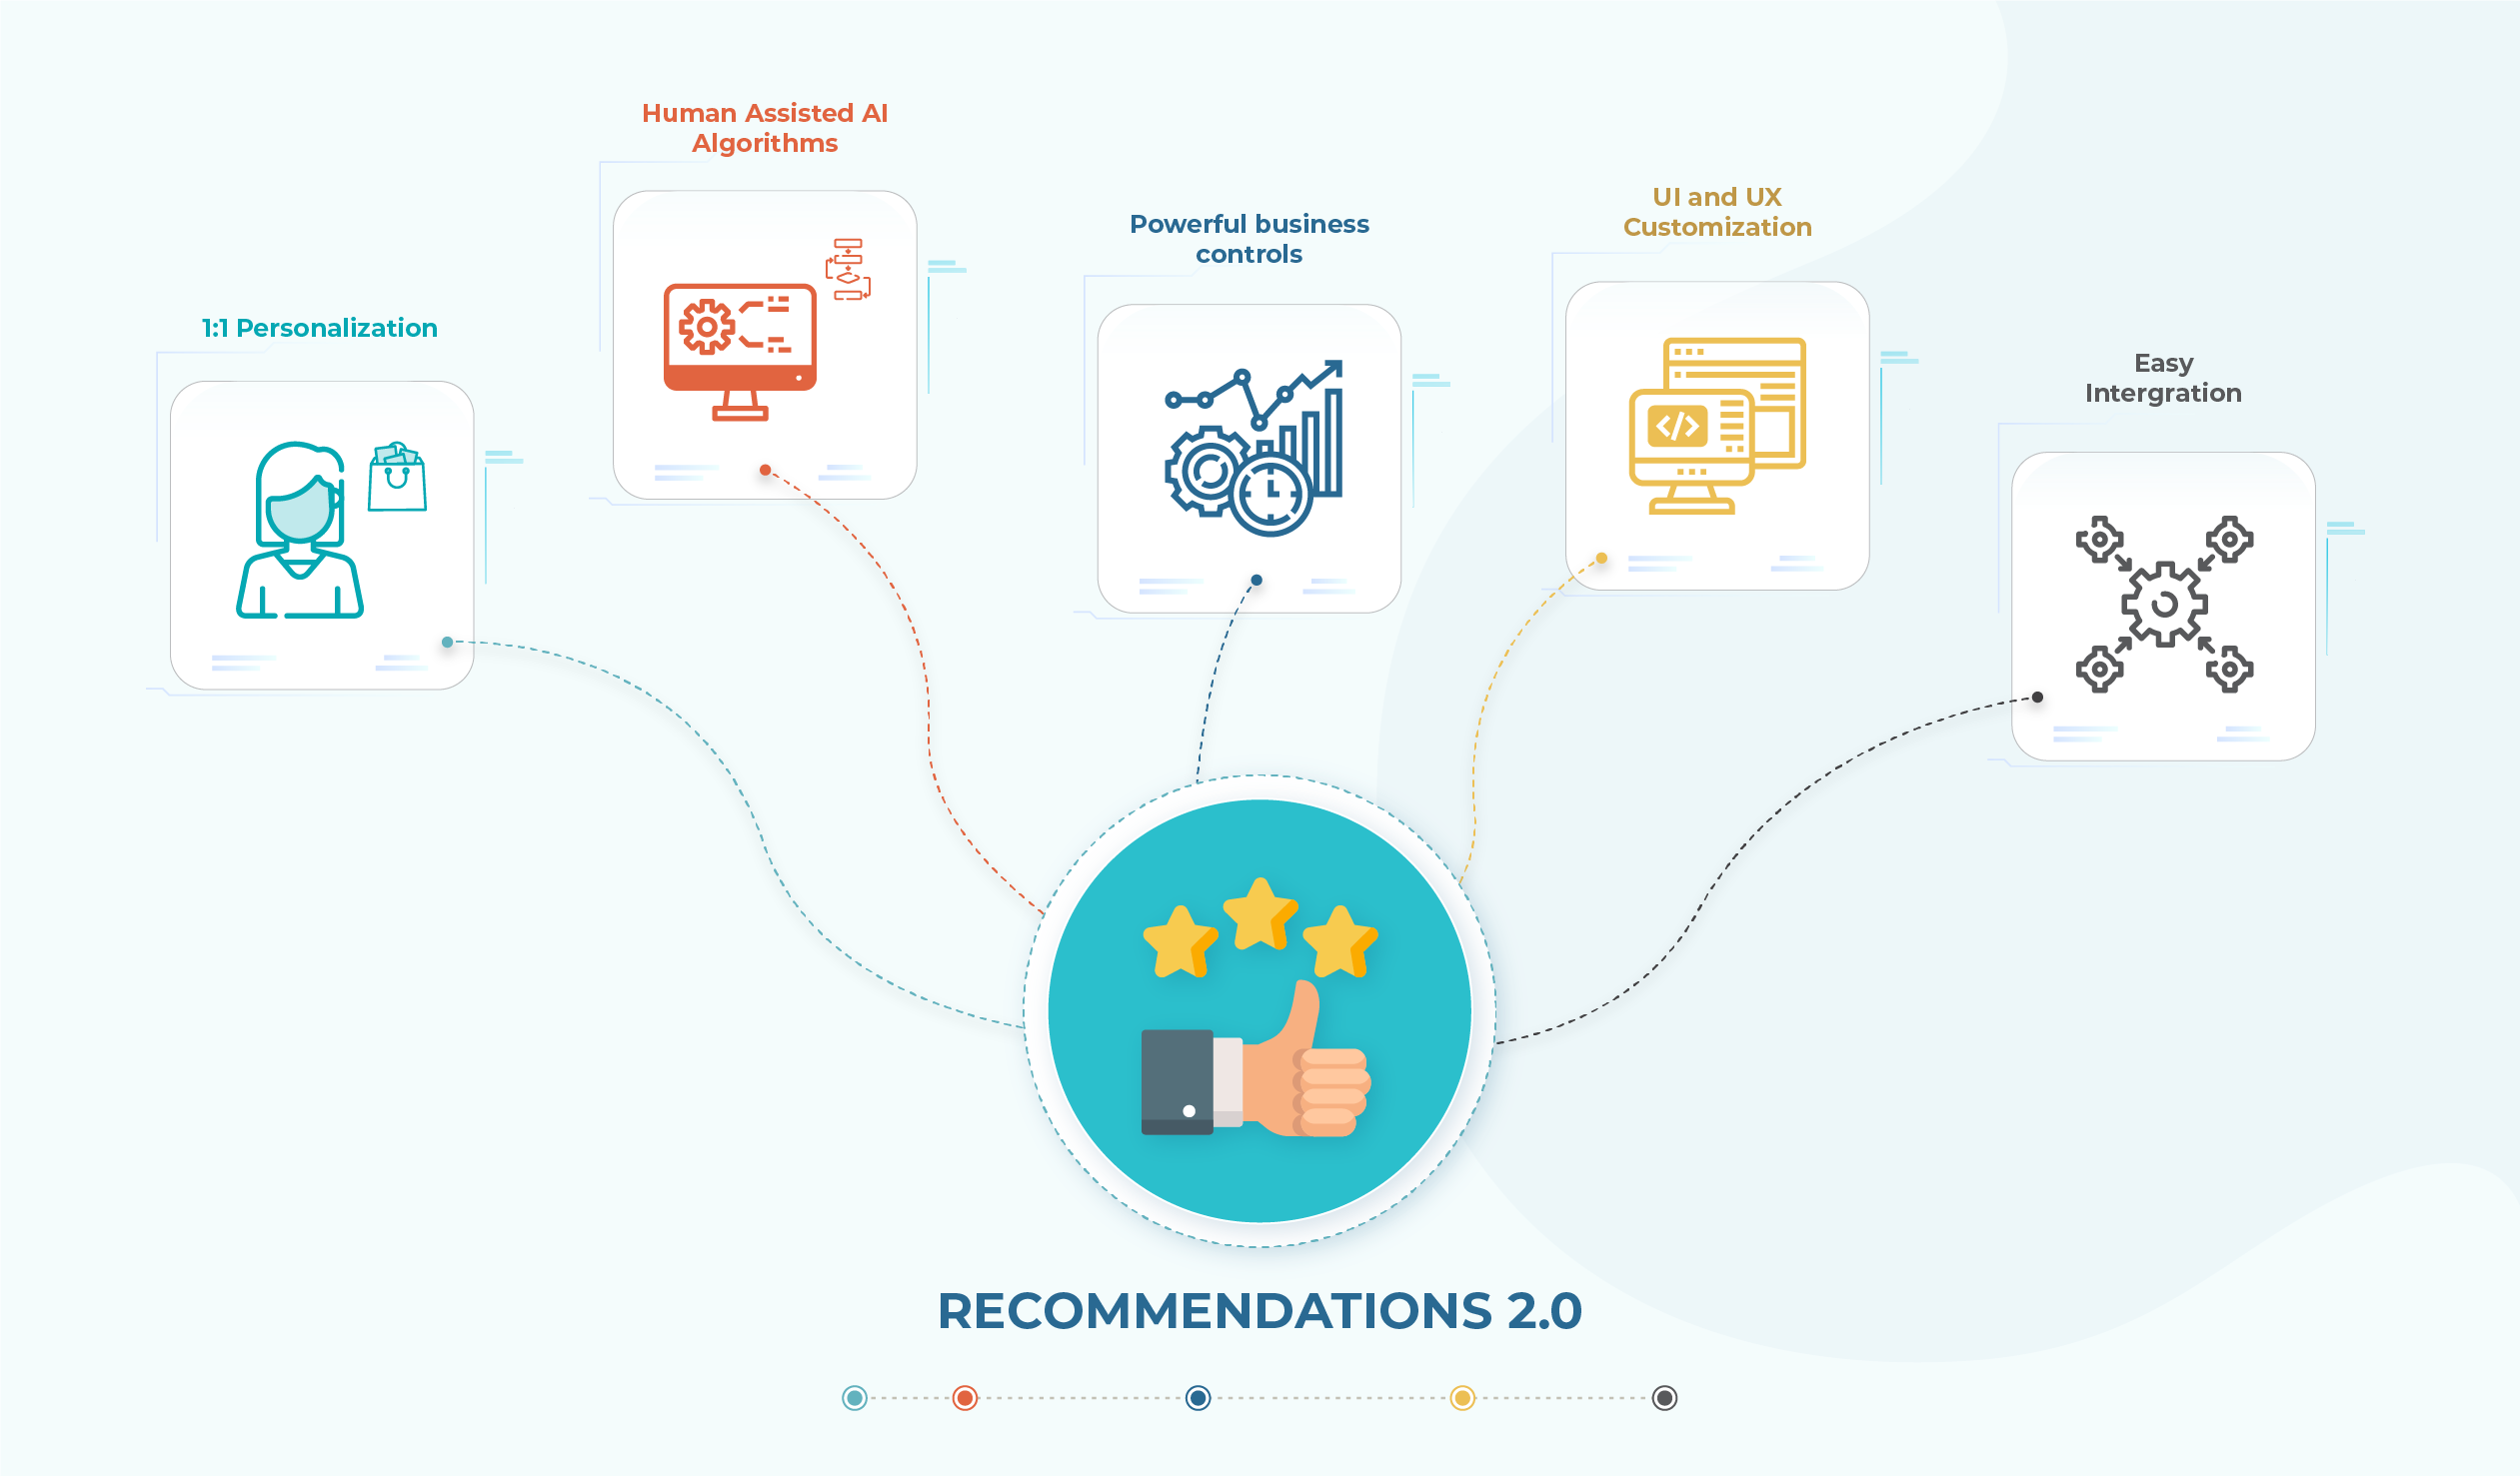 Unbxd Recommendations 2.0